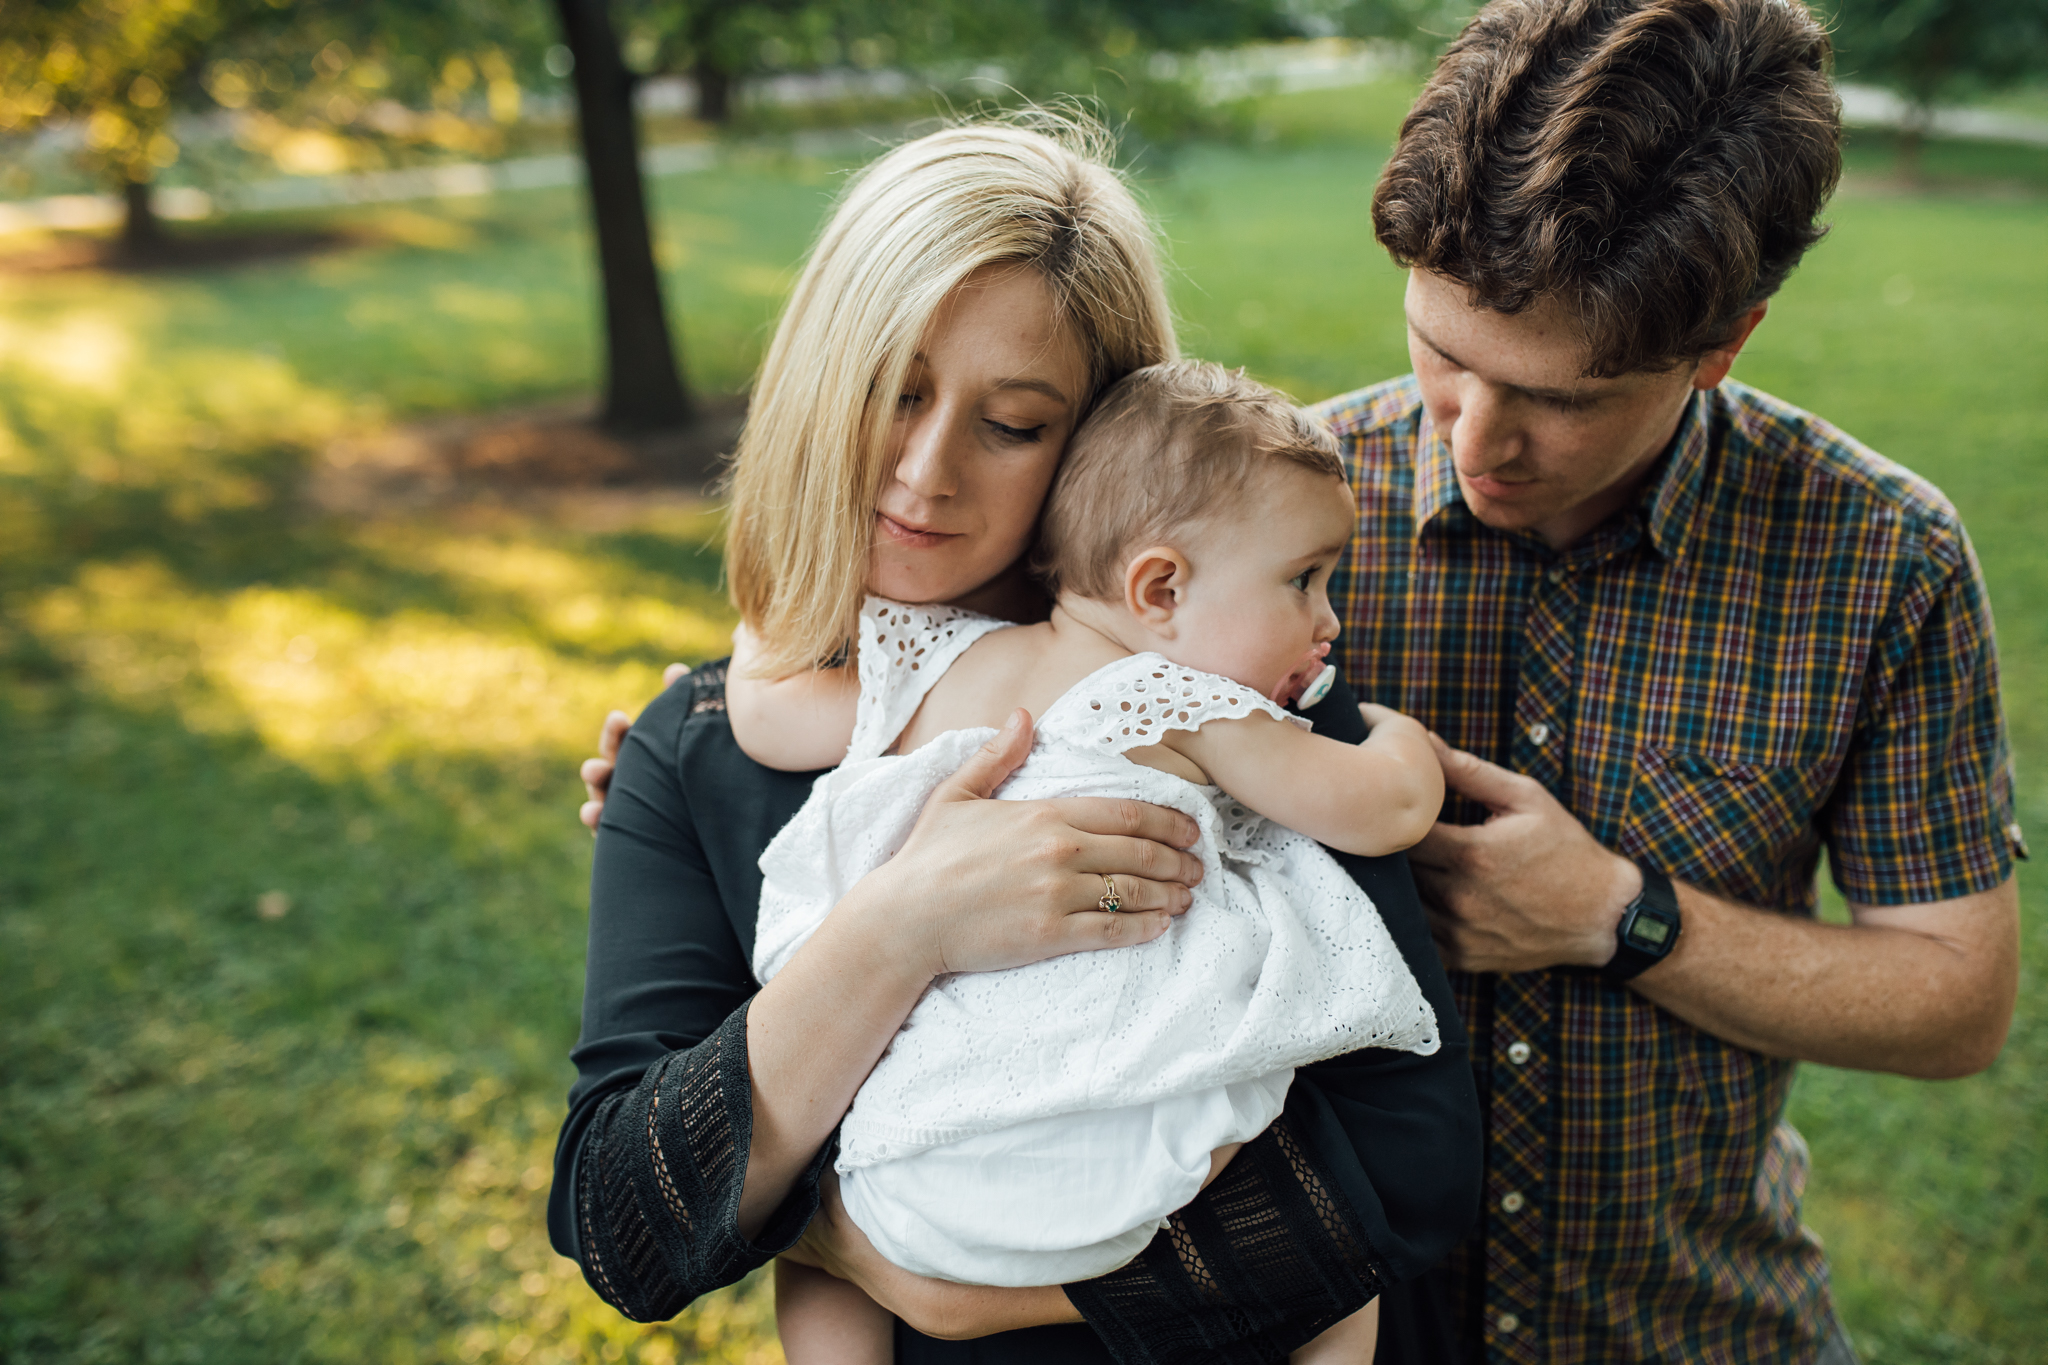 memphis-family-photographer-thewarmtharoundyou-overton-park (18 of 20).jpg